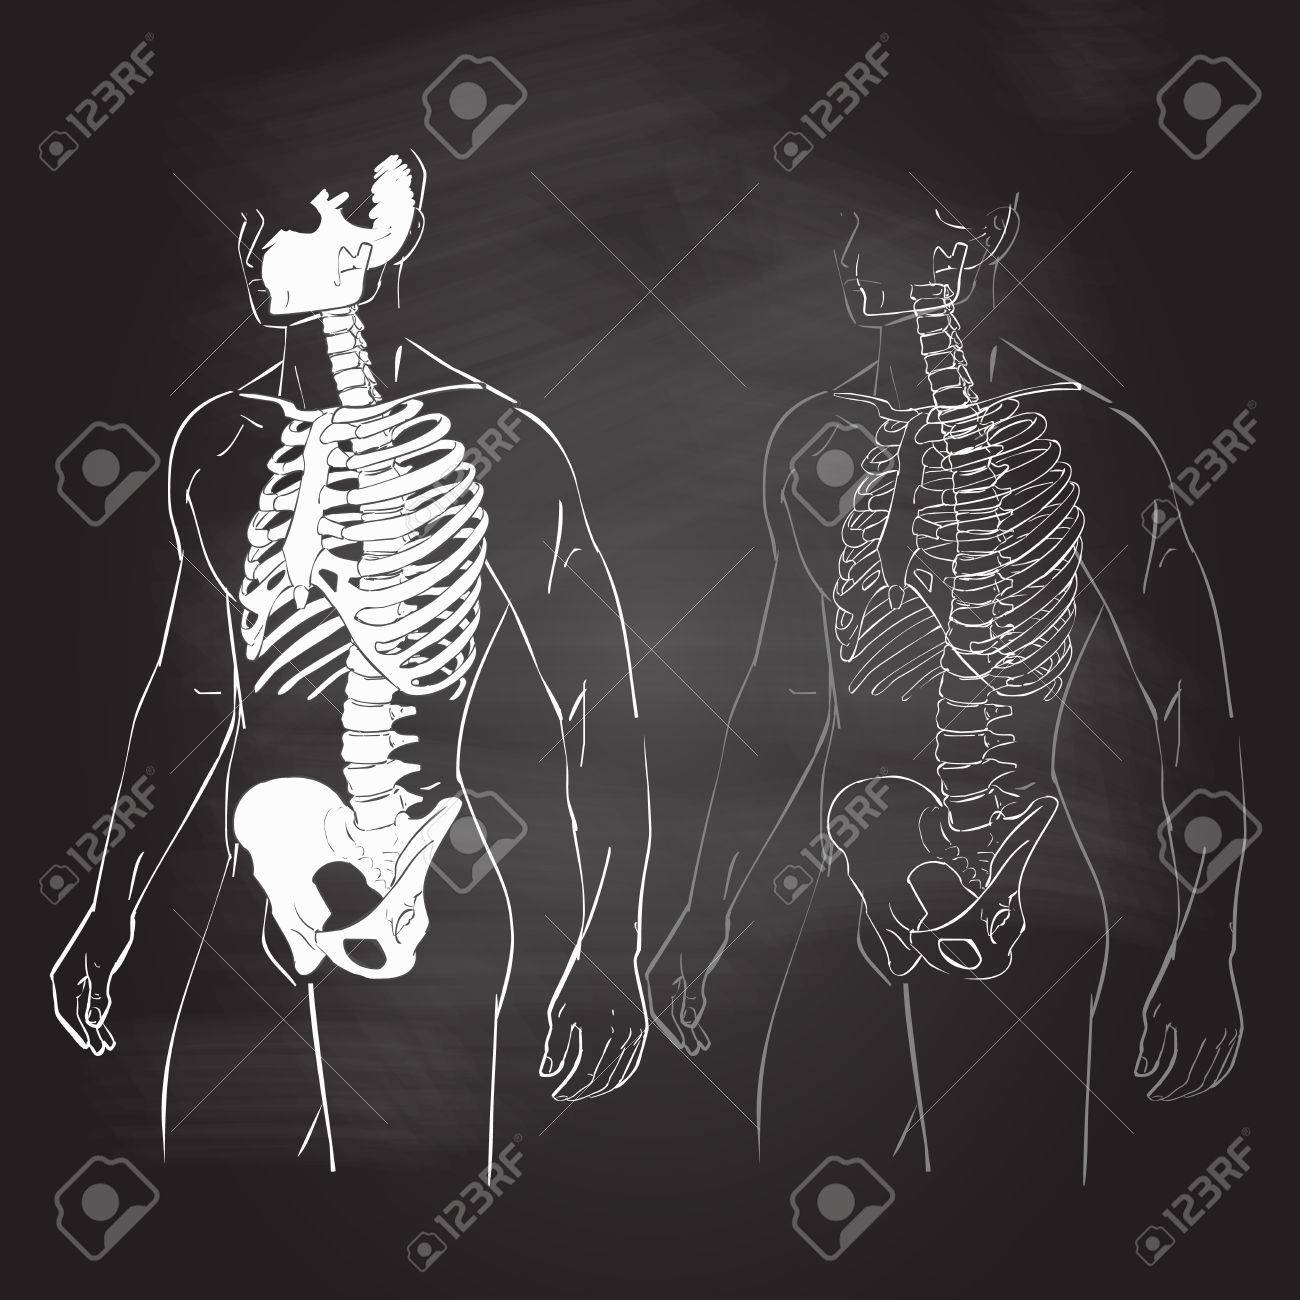 Human Body Parts Skeletal Man Anatomy Illustration Chalk Drawing